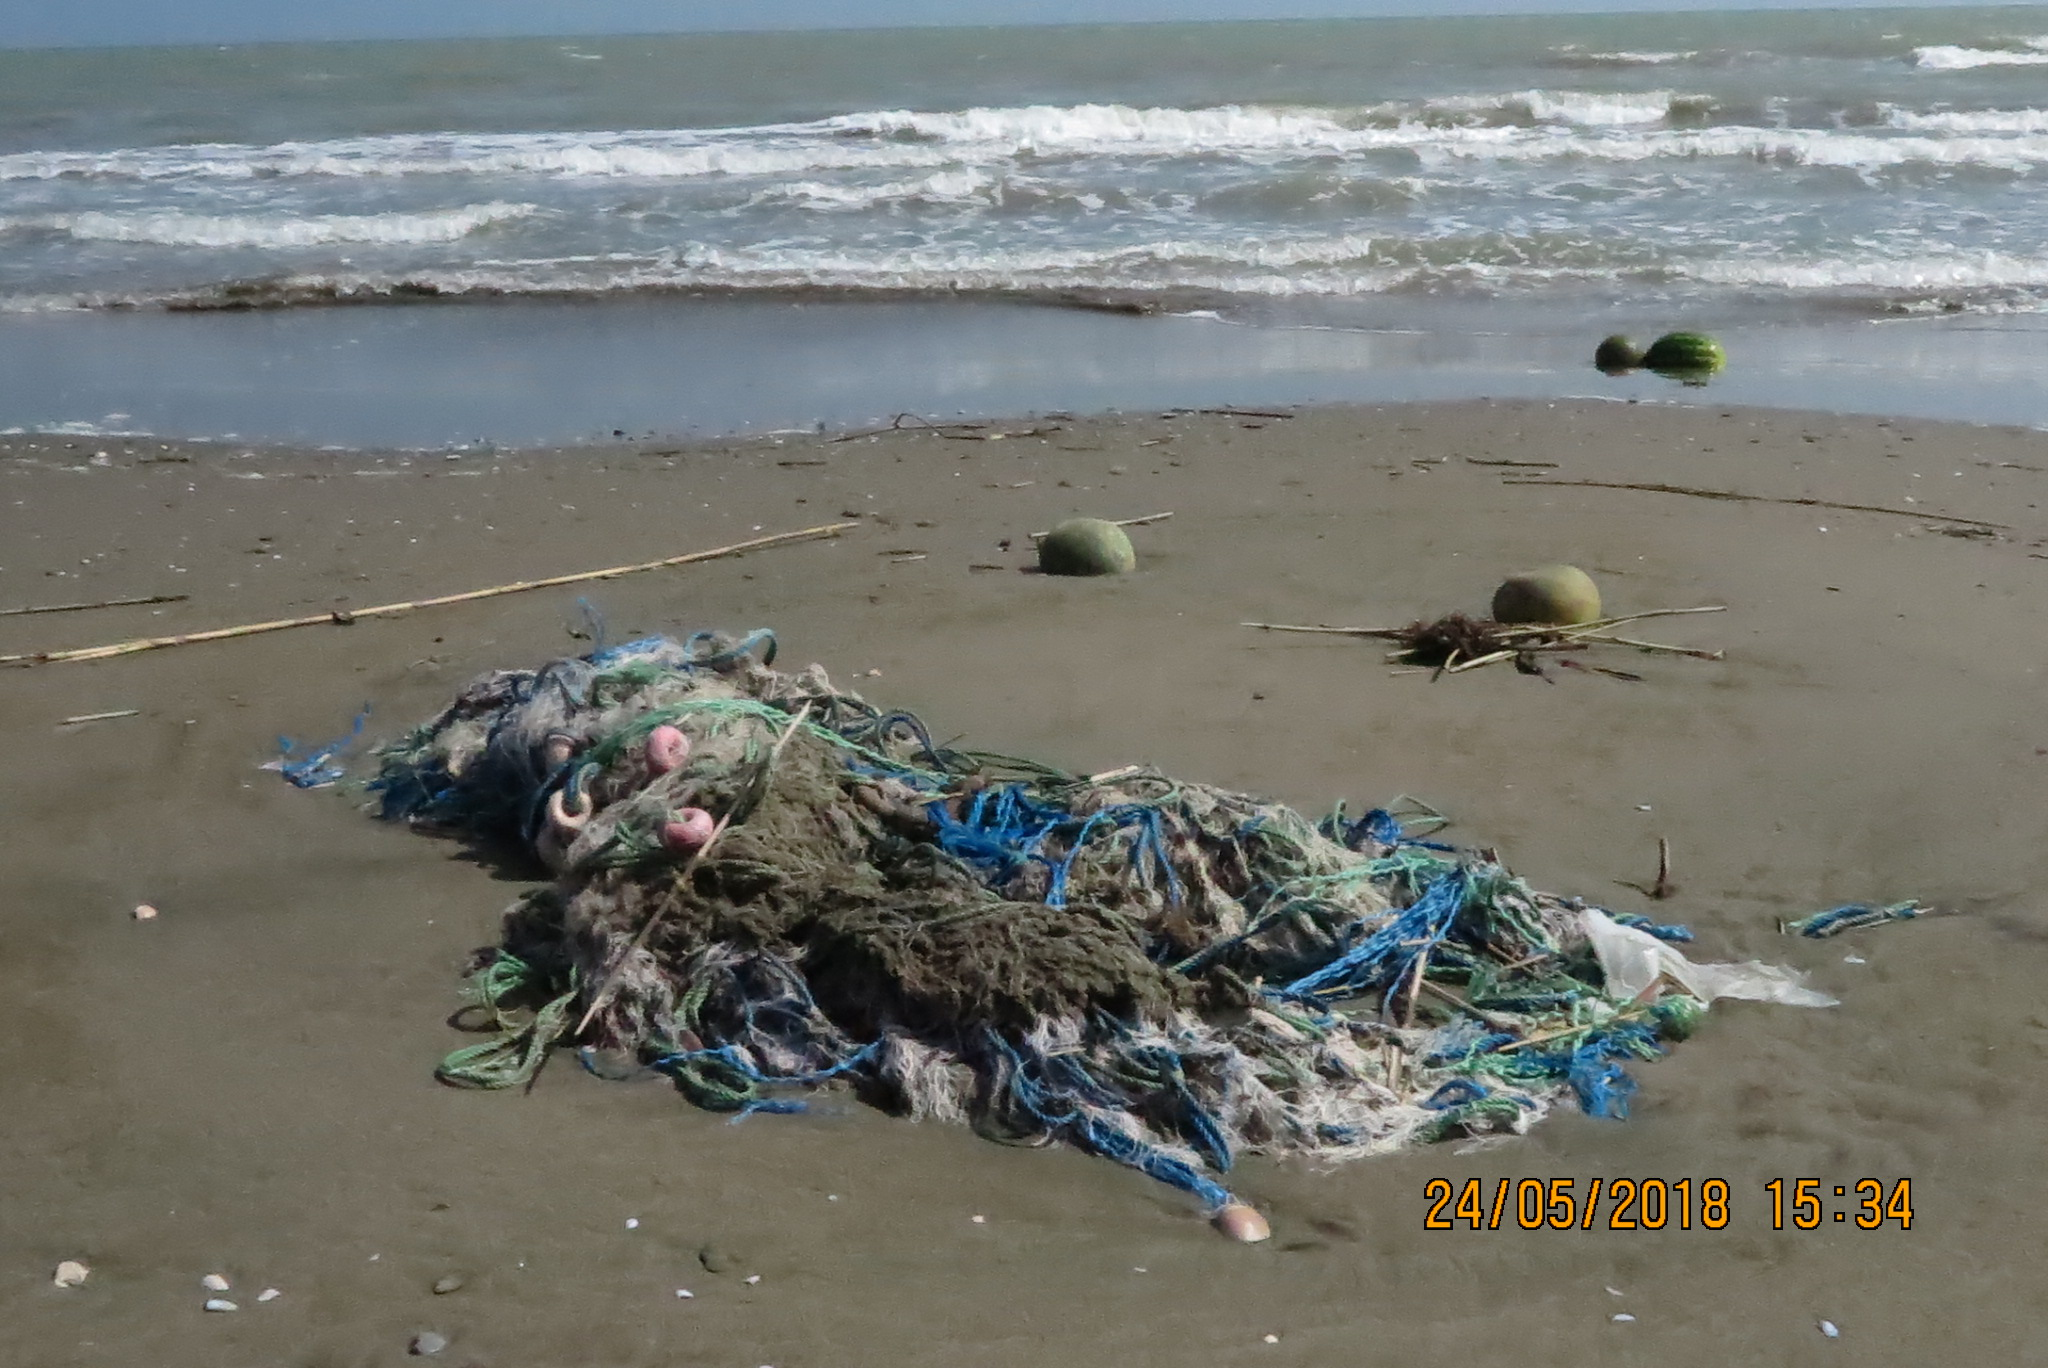 mikroplastik sorunu